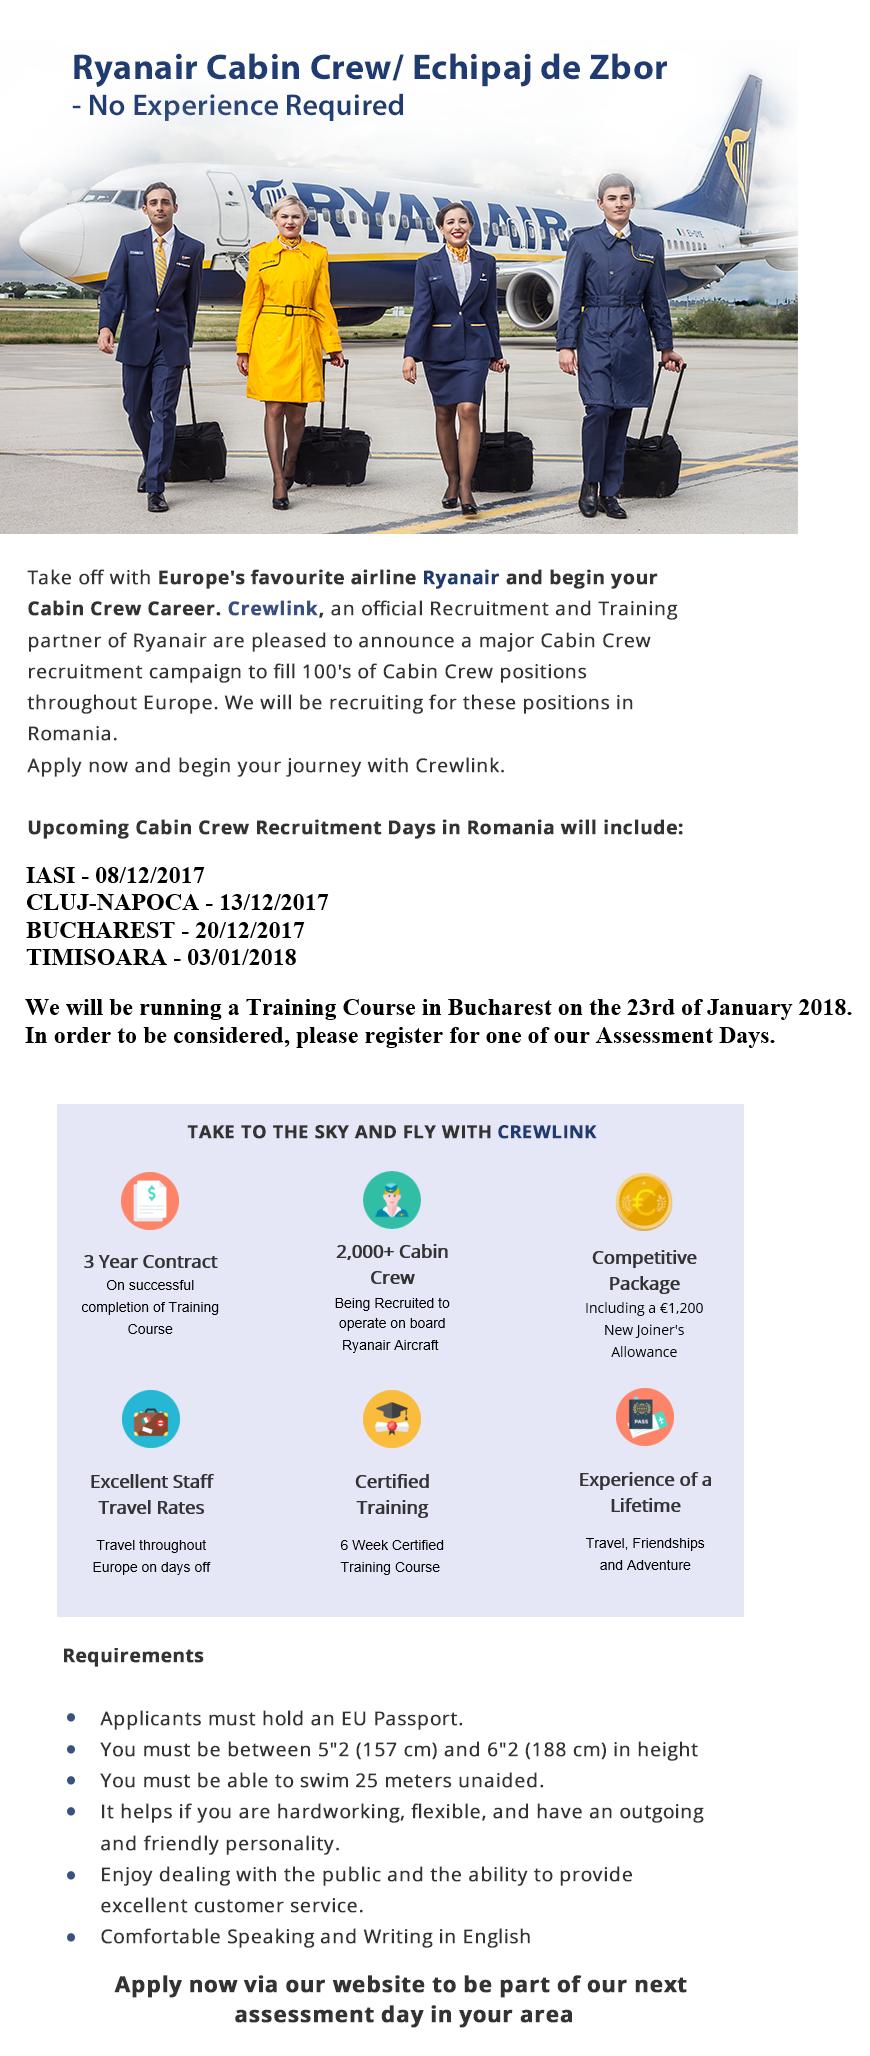 Ryanair Cabin Crew/Flight Attendant - No Experience Required